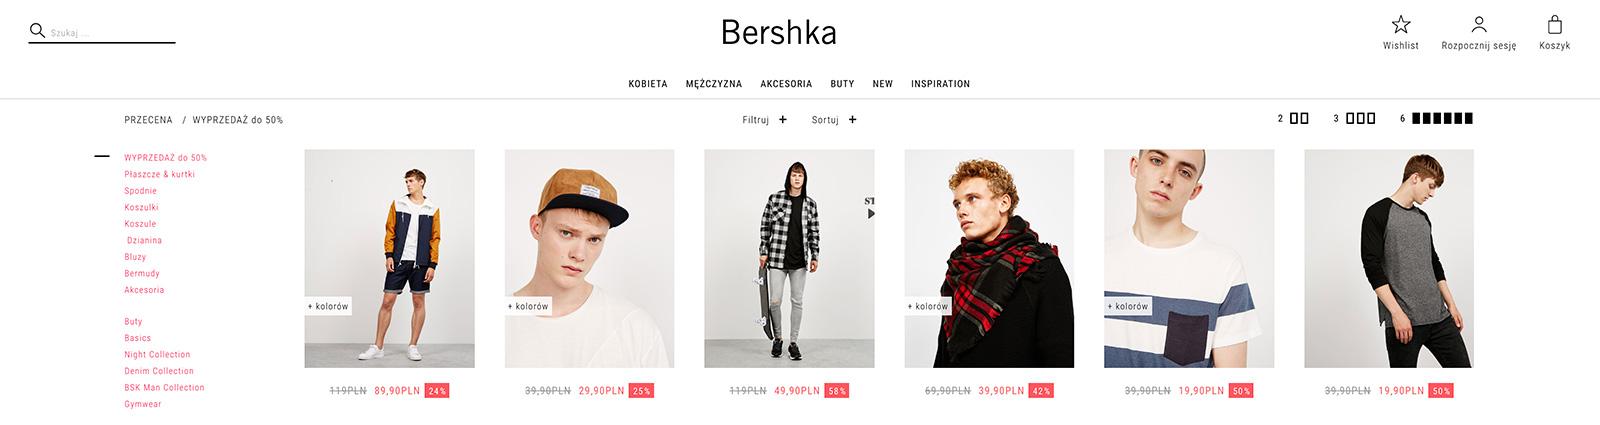 bershka